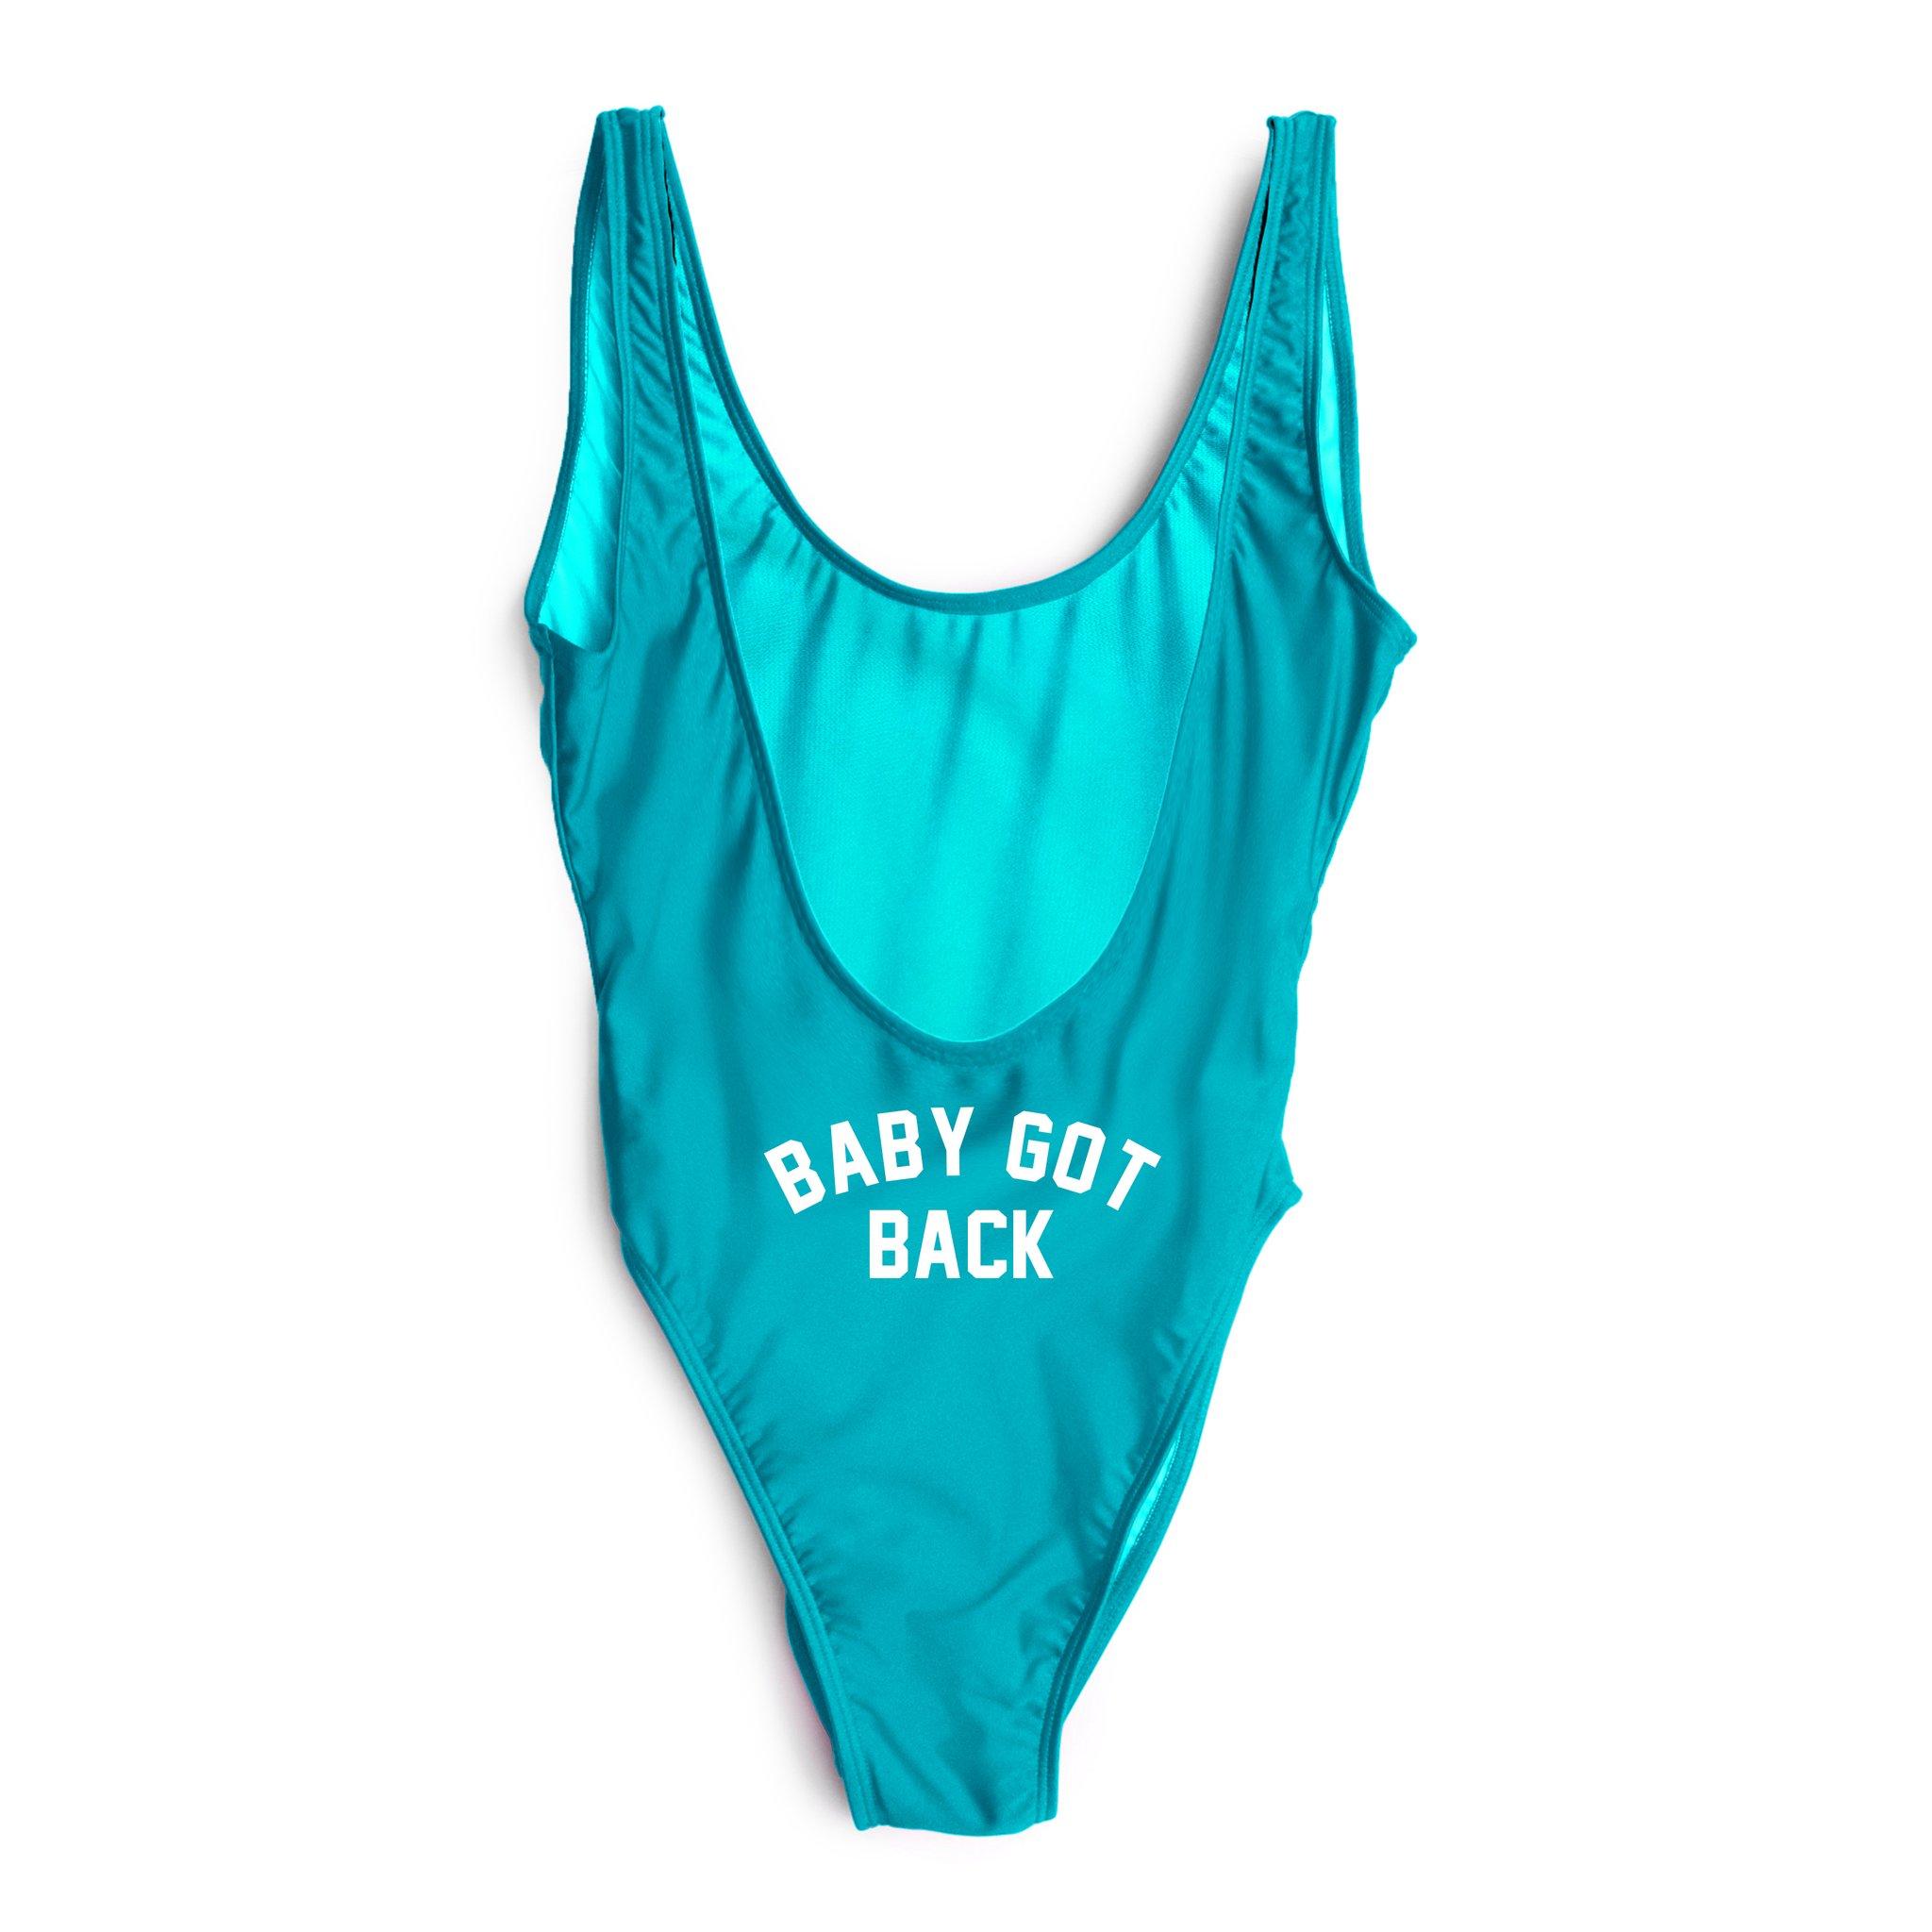 6ac60fcc6c PEACH EMOJI // BUTT PRINT California Women Swimsuit One Piece ...